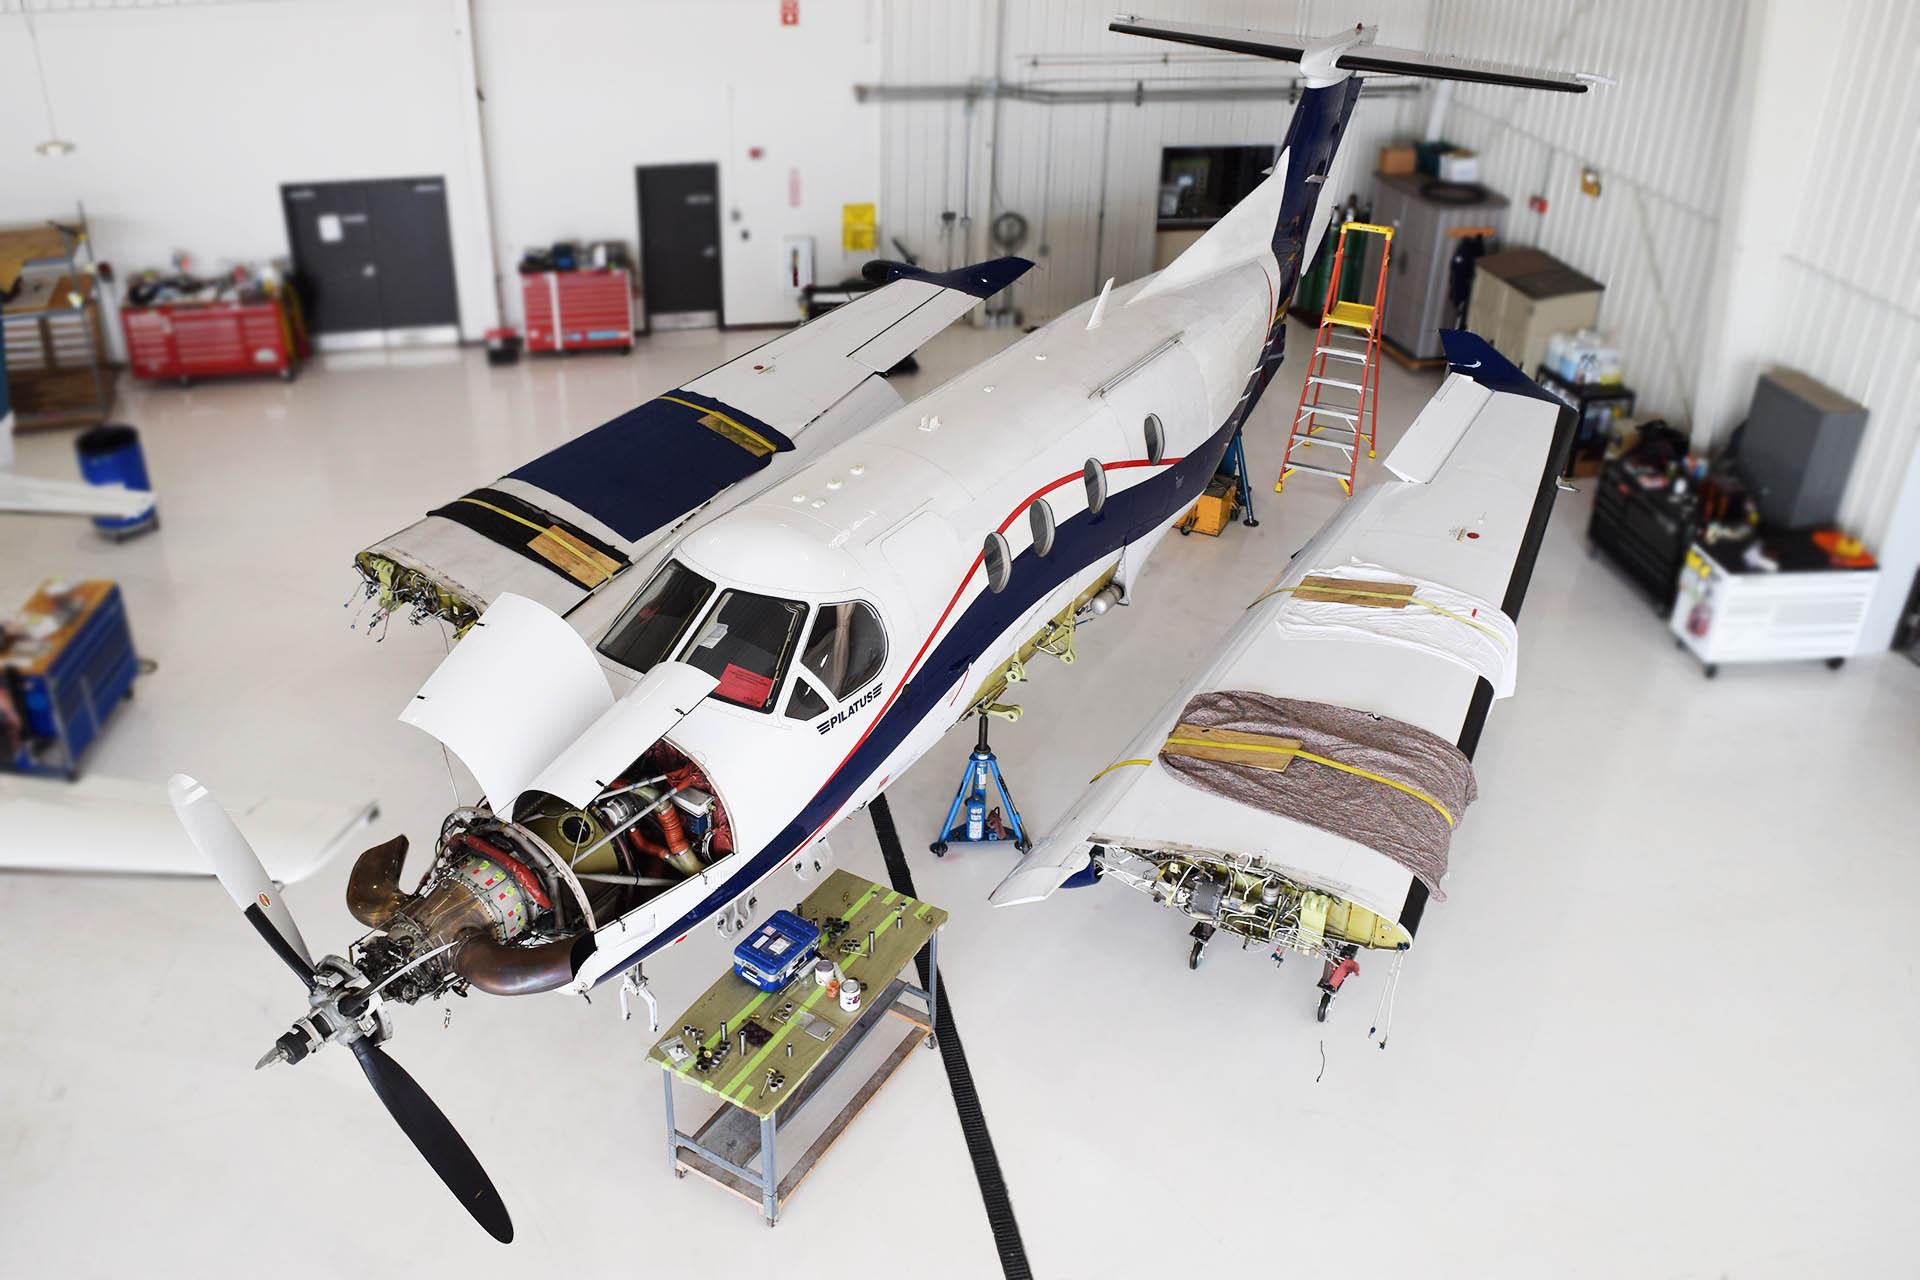 pc-12 pilatus service wing demate fargo jet center